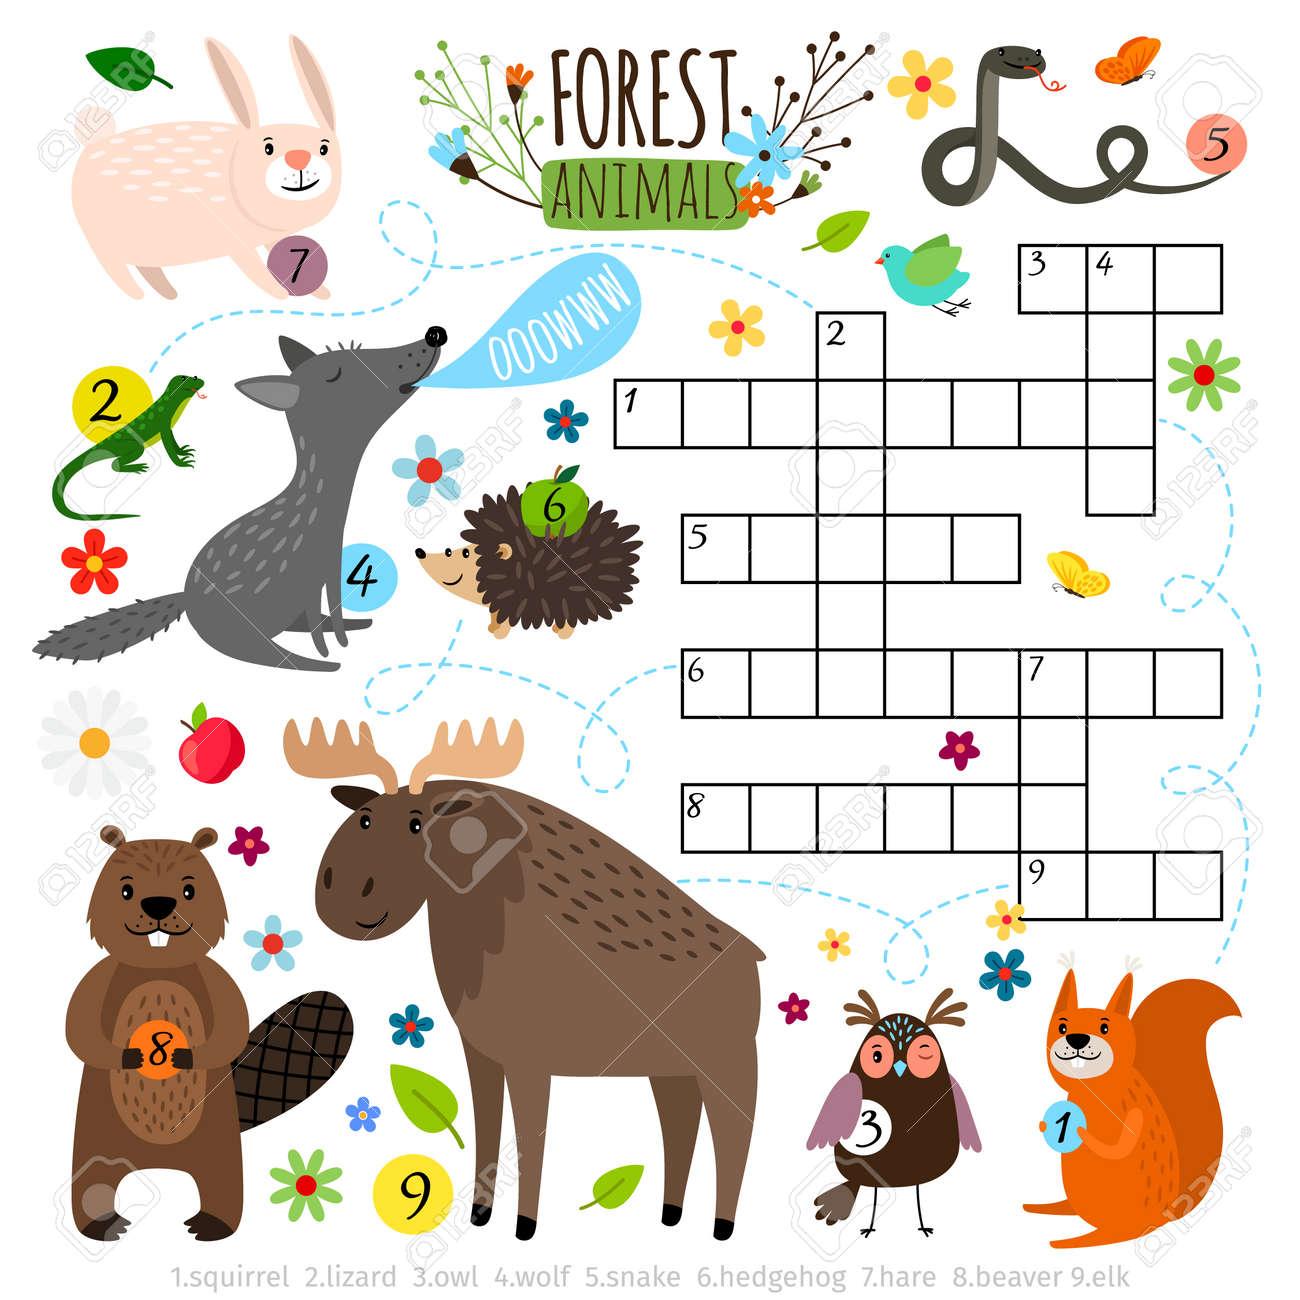 Forest animals crossword puzzle - 167508187